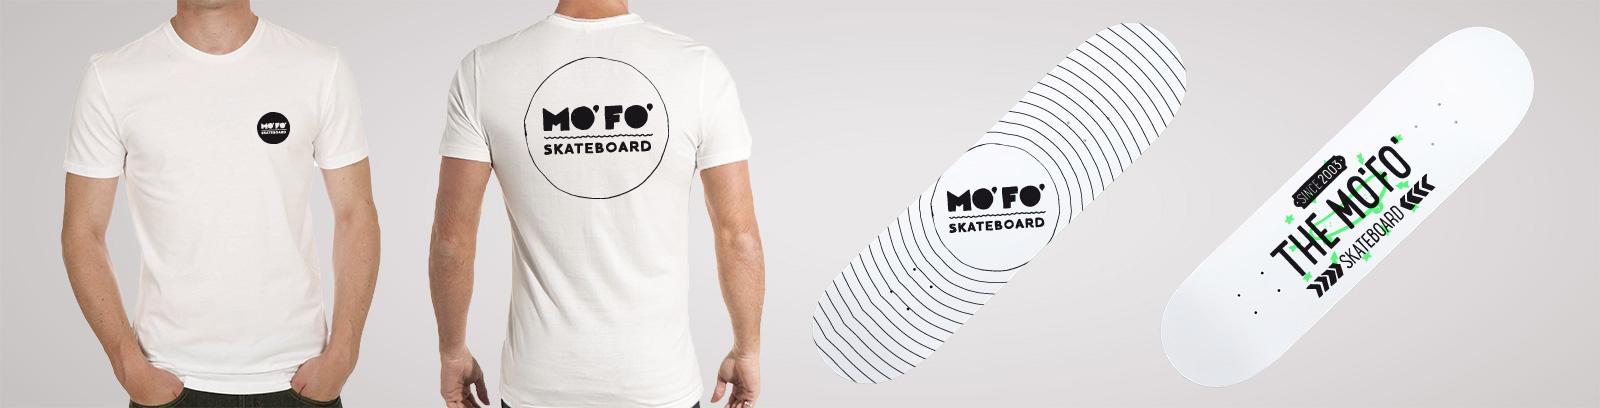 MOfo-TSHIRT-et-board-2014